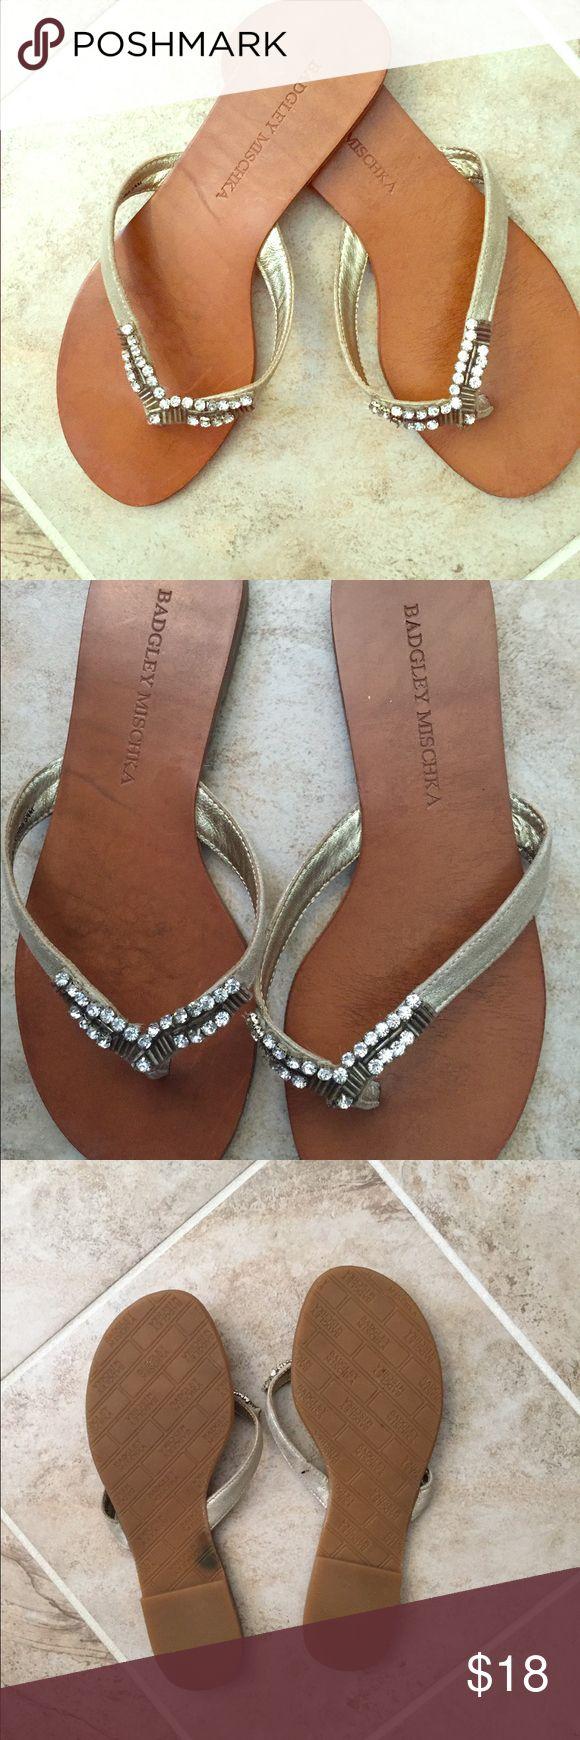 Selling this Badgley Mischka leather dressy flip flops on Poshmark! My username is: delightboutique. #shopmycloset #poshmark #fashion #shopping #style #forsale #Badgley Mischka #Shoes